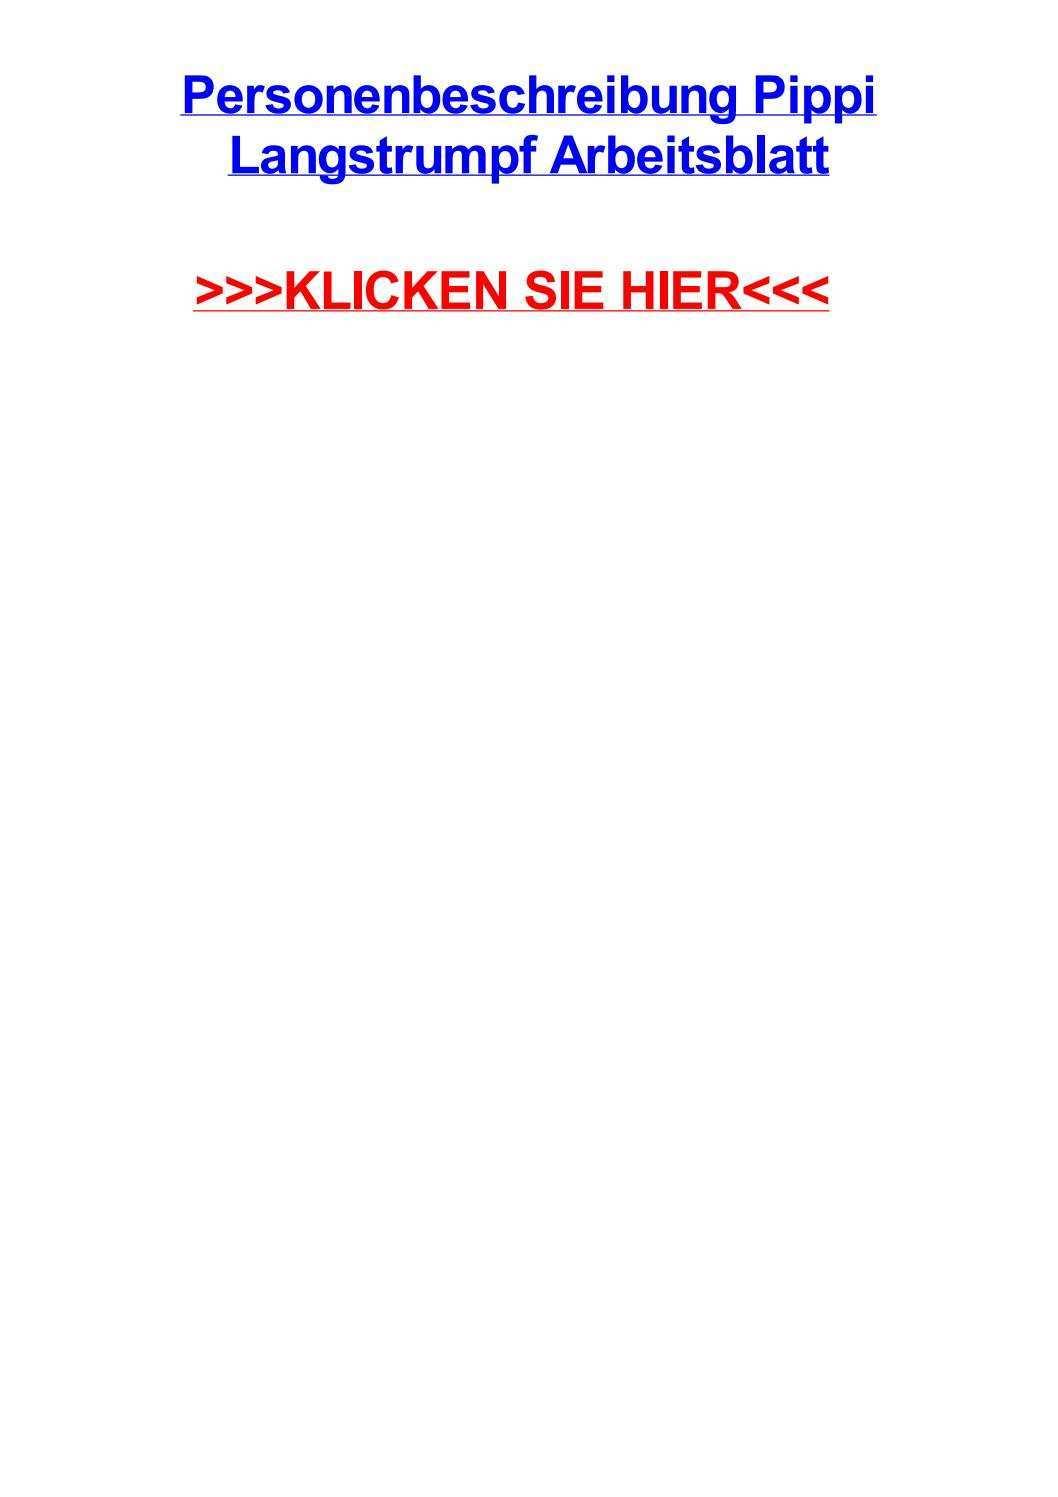 Personenbeschreibung Pippi Langstrumpf Arbeitsblatt By Johnohtlu Issuu